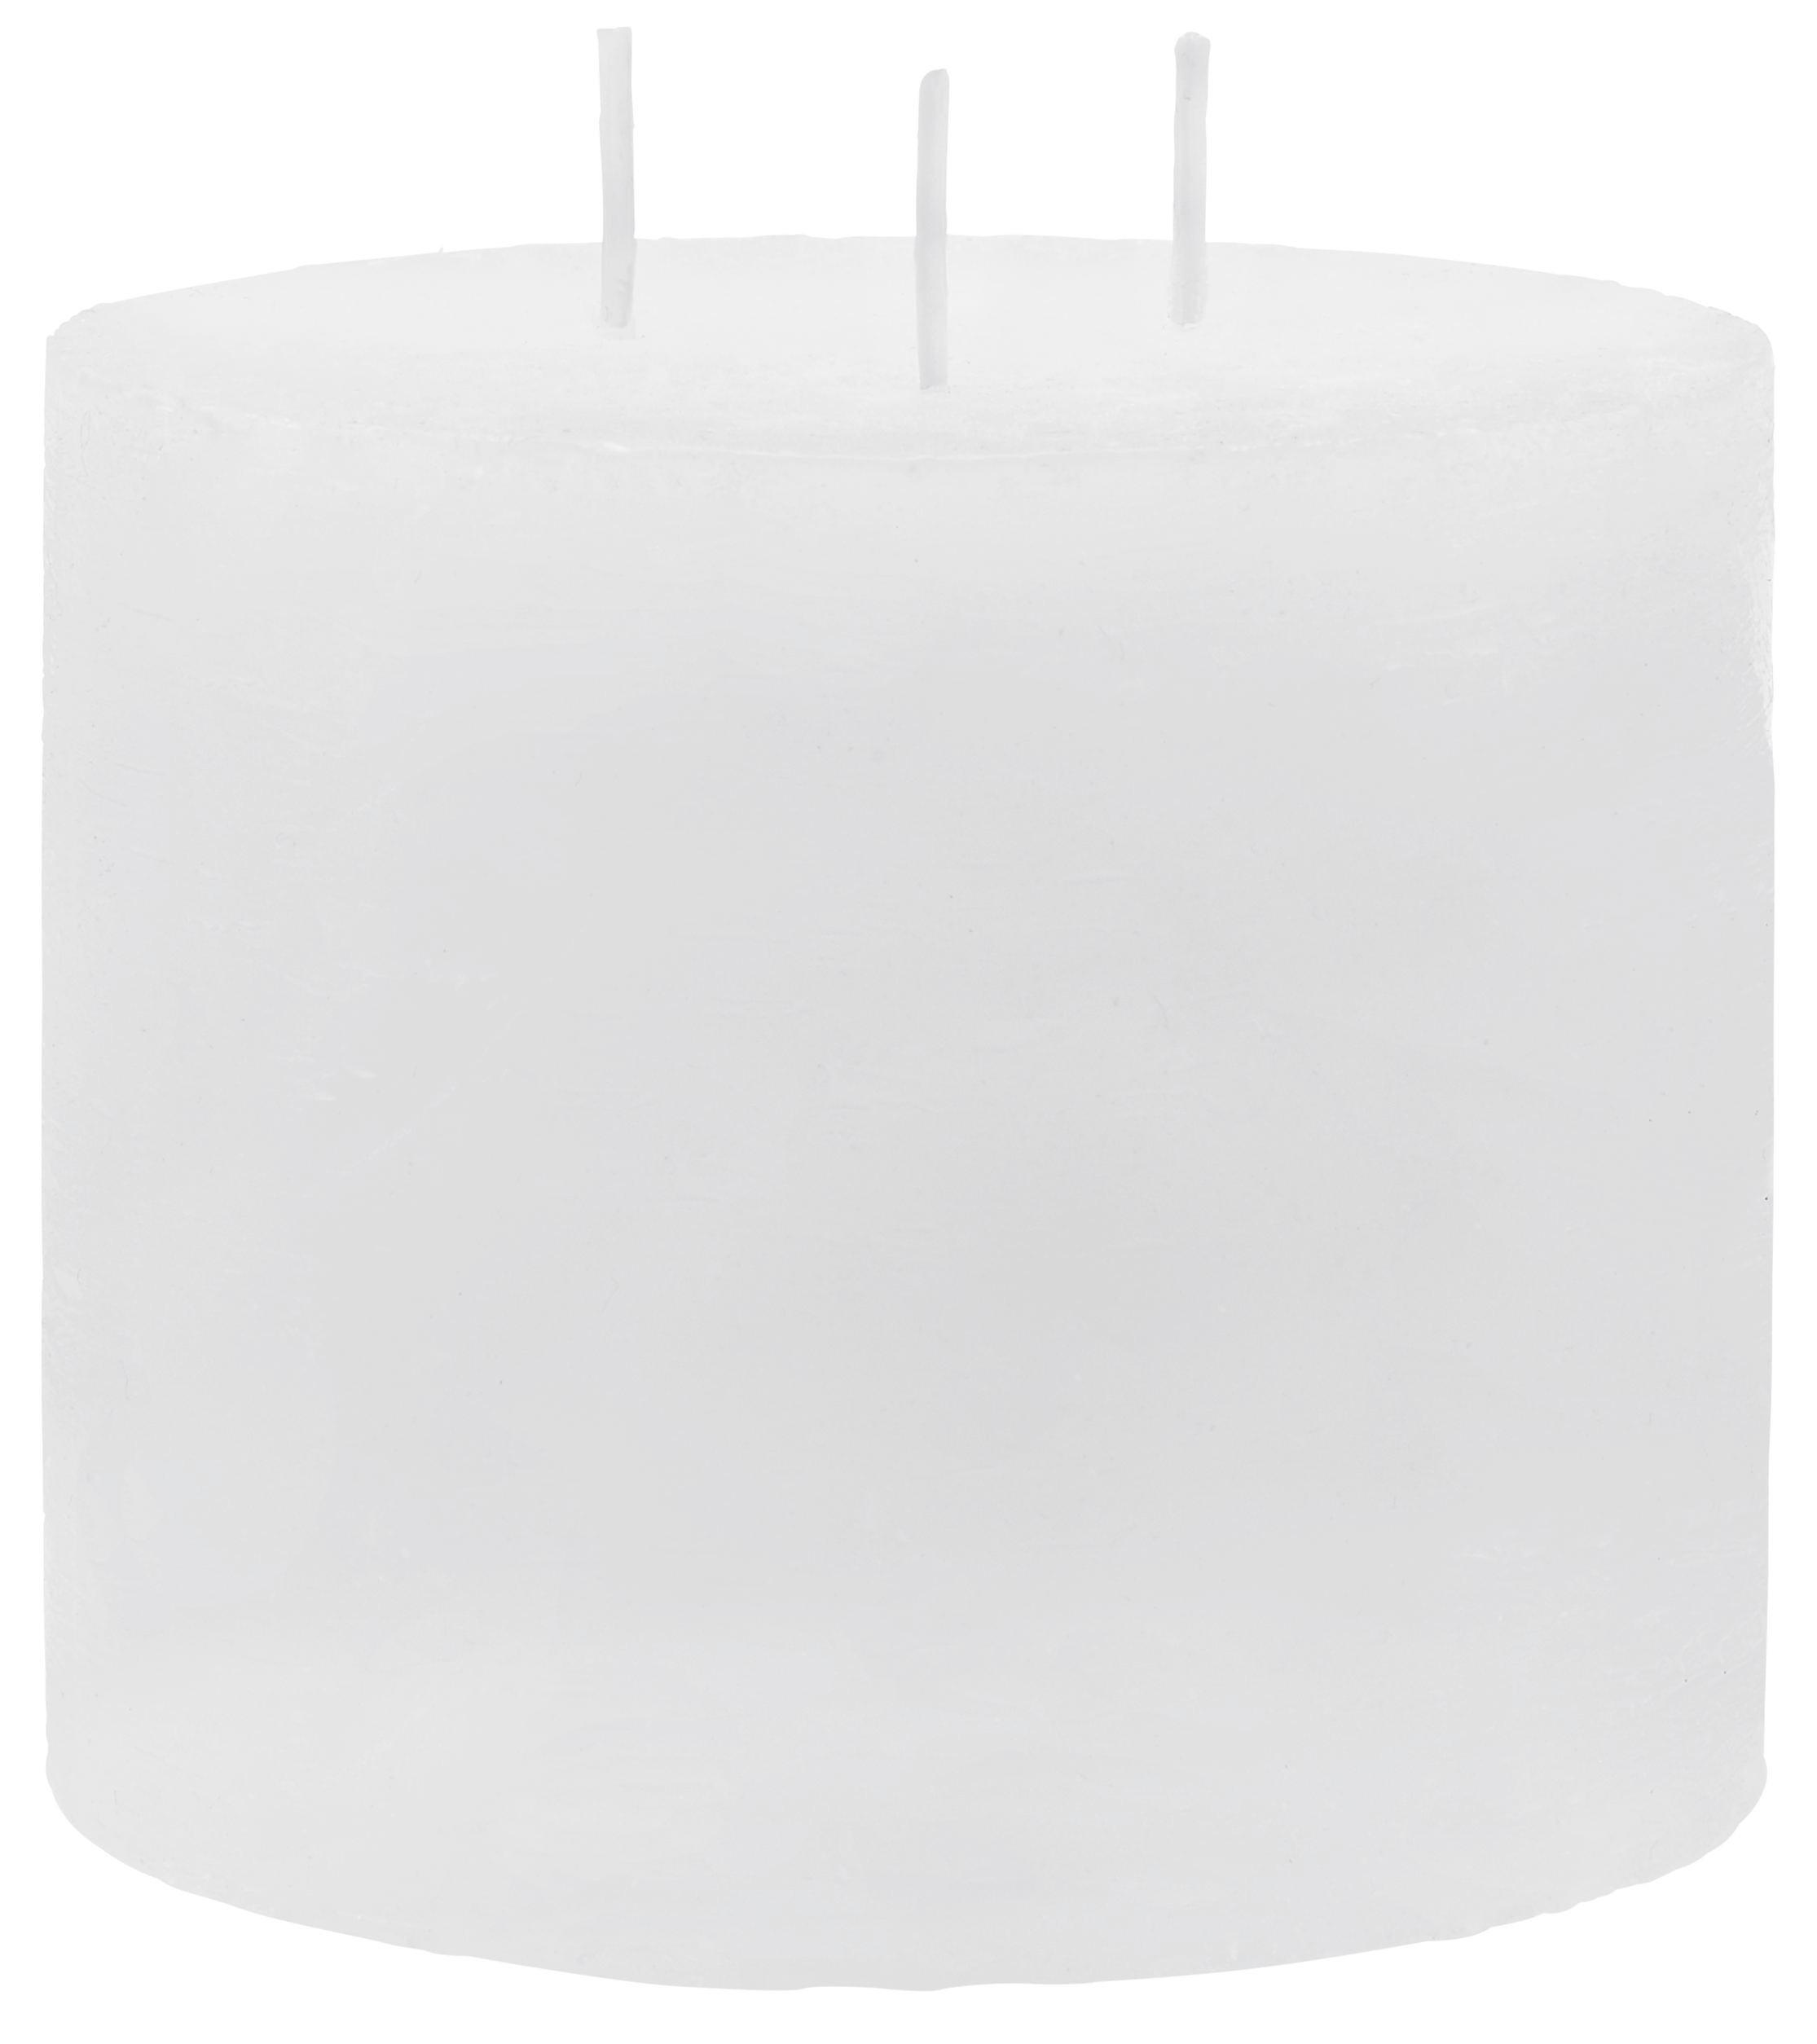 Dreidochtkerze Lia in Weiß - Weiß, MODERN (12/10cm) - MÖMAX modern living